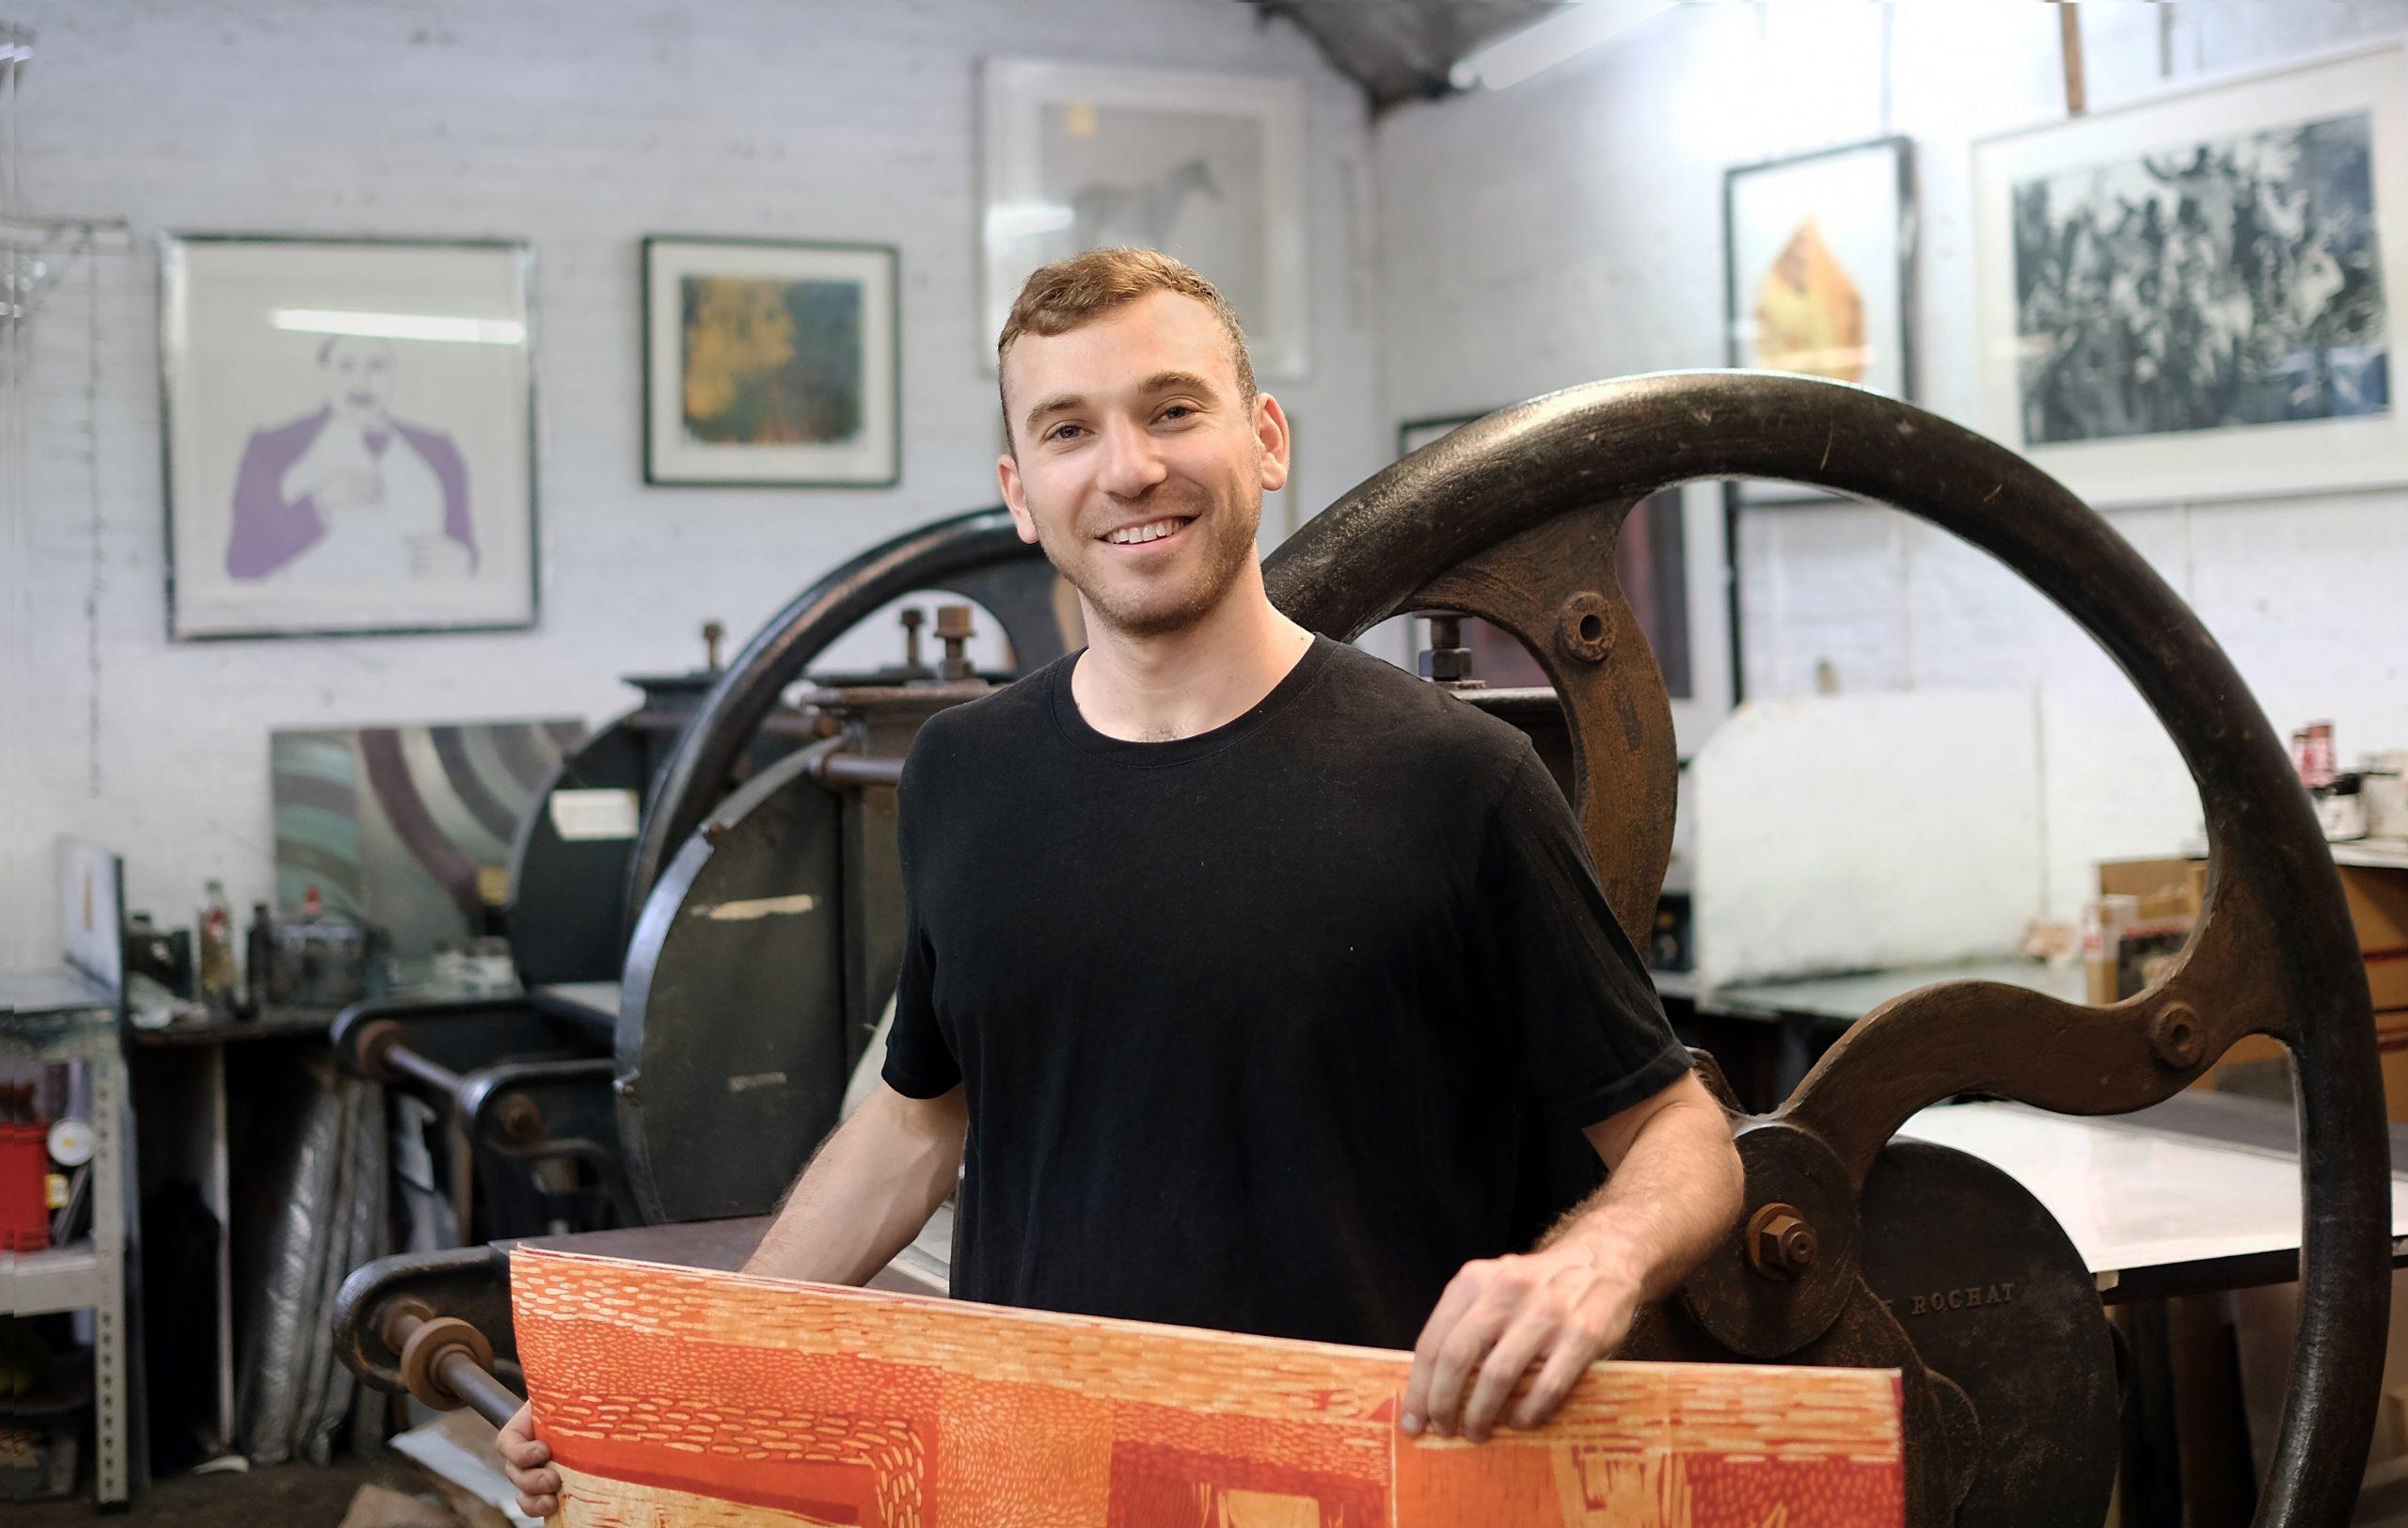 Jake Garfield, artist printmaker